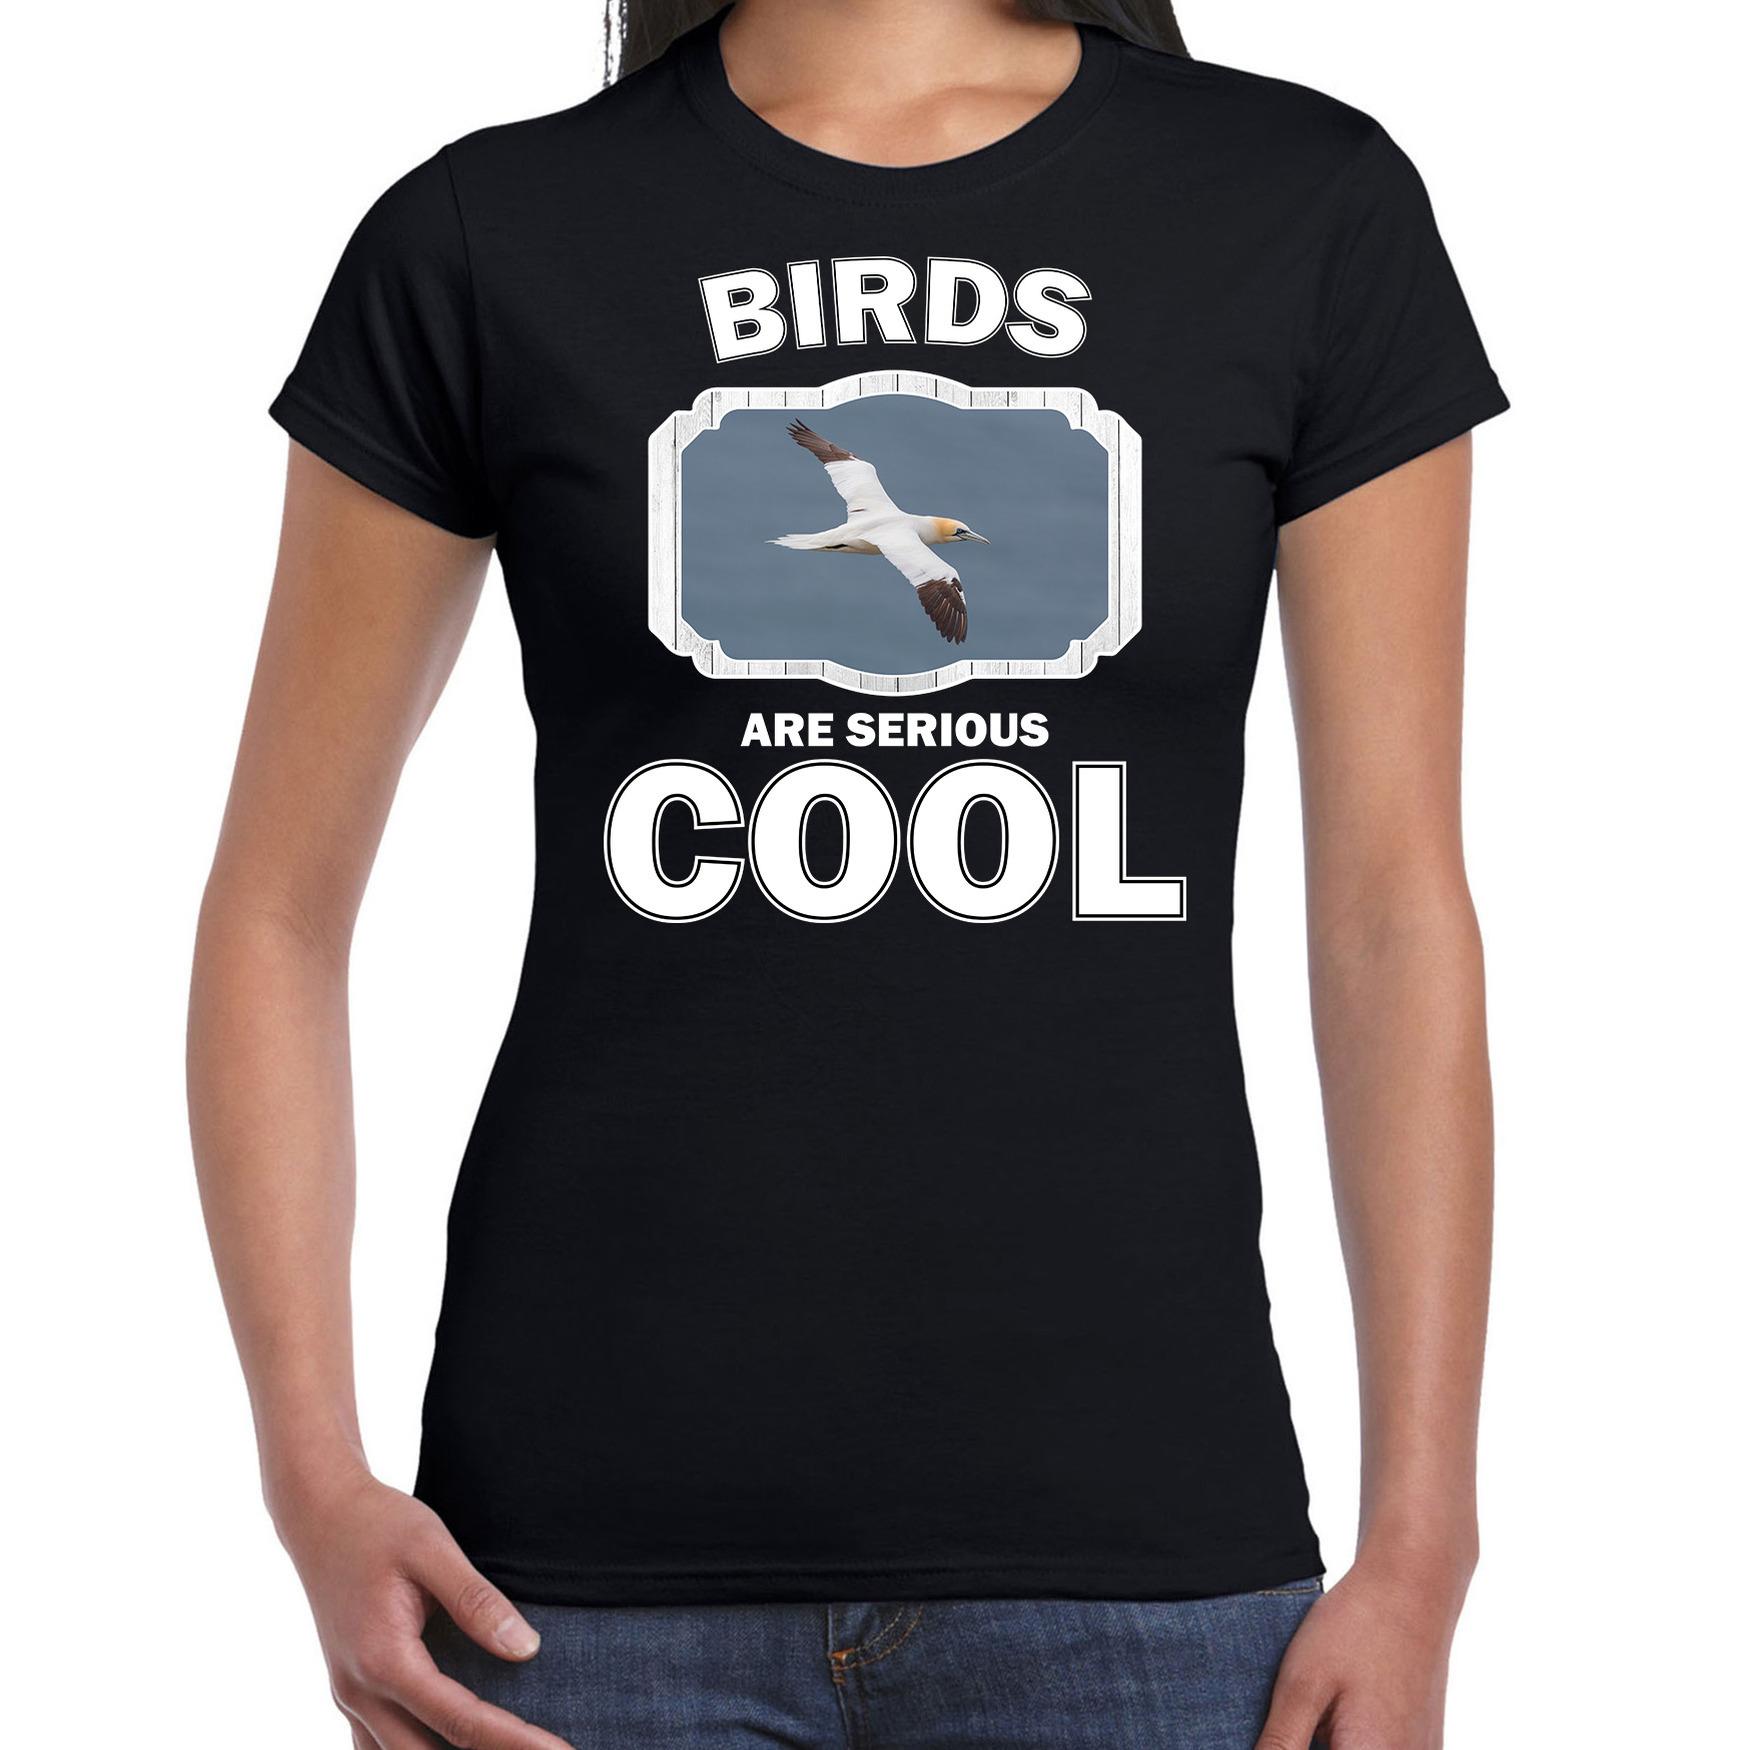 T-shirt birds are serious cool zwart dames - vogels/ jan van gent vogel shirt